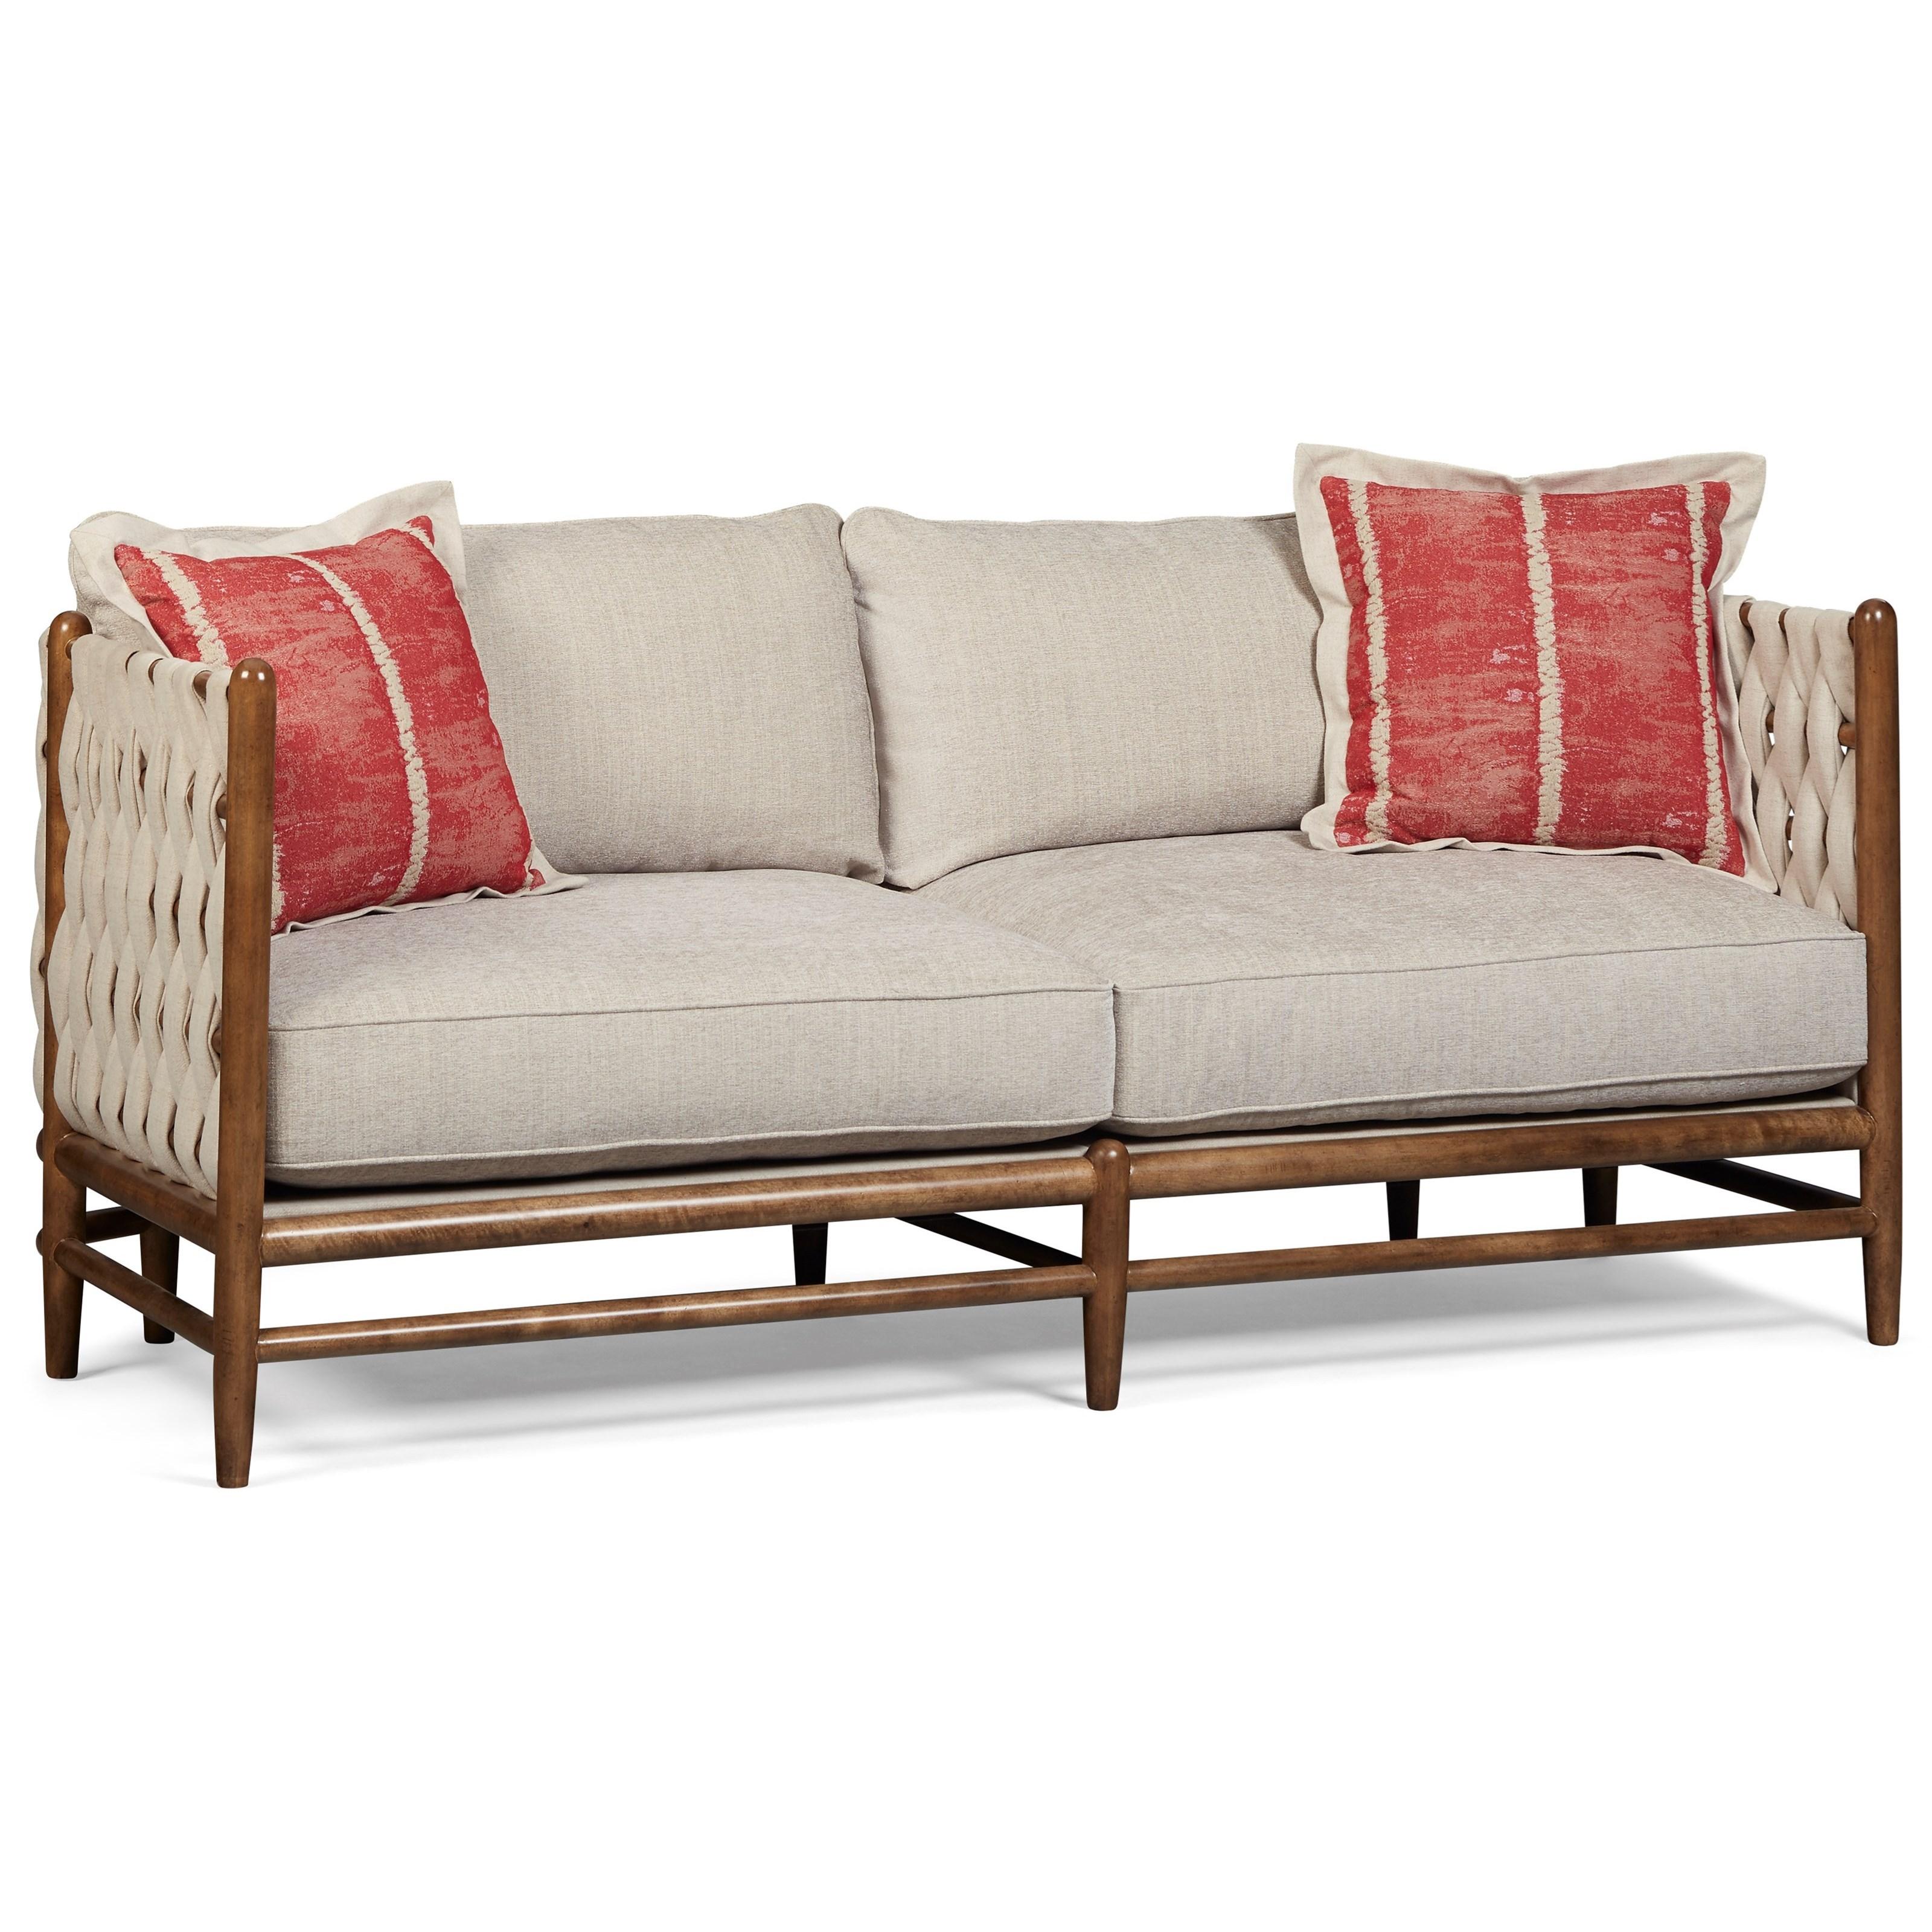 A.R.T. Furniture Inc Epicenters AustinAbbott Sofa ...